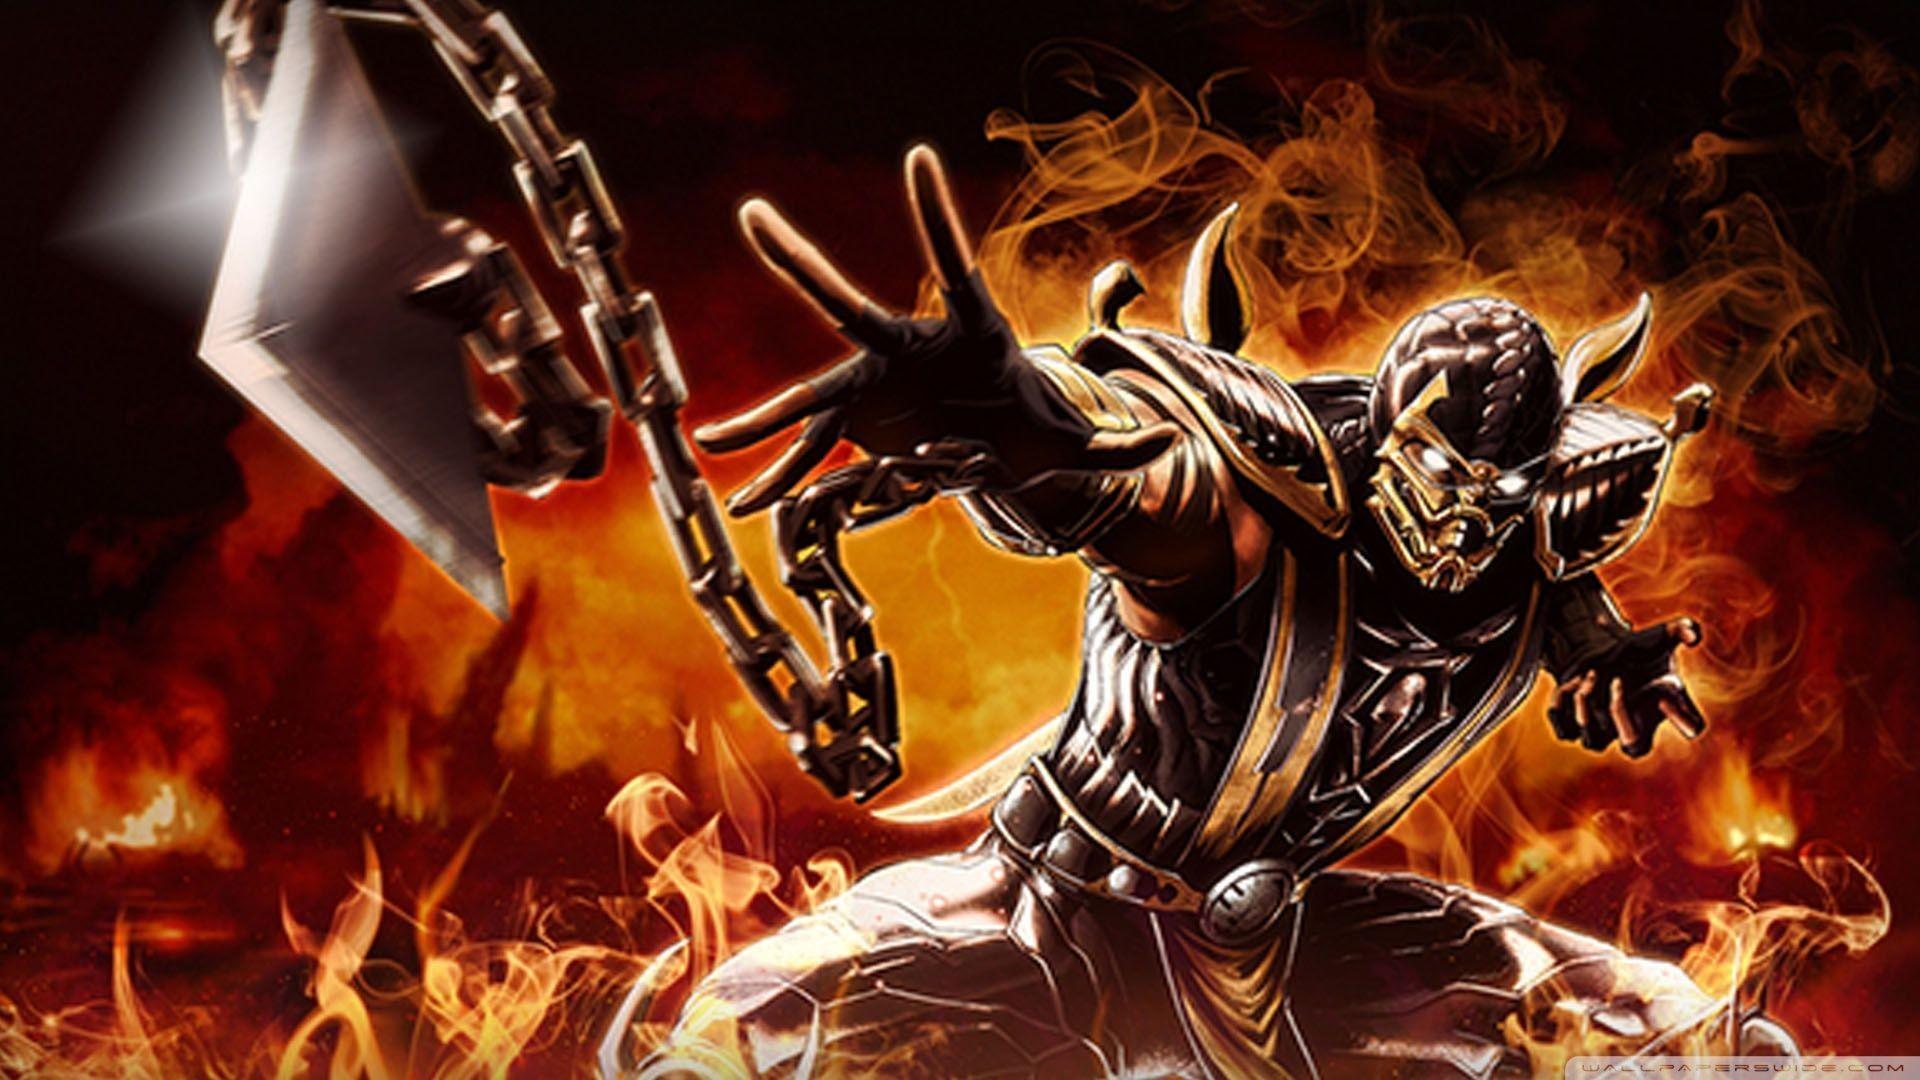 Mortal Kombat X Wallpapers High Quality Download Free 1920×1080 Mortal  Kombat Wallpaper (29